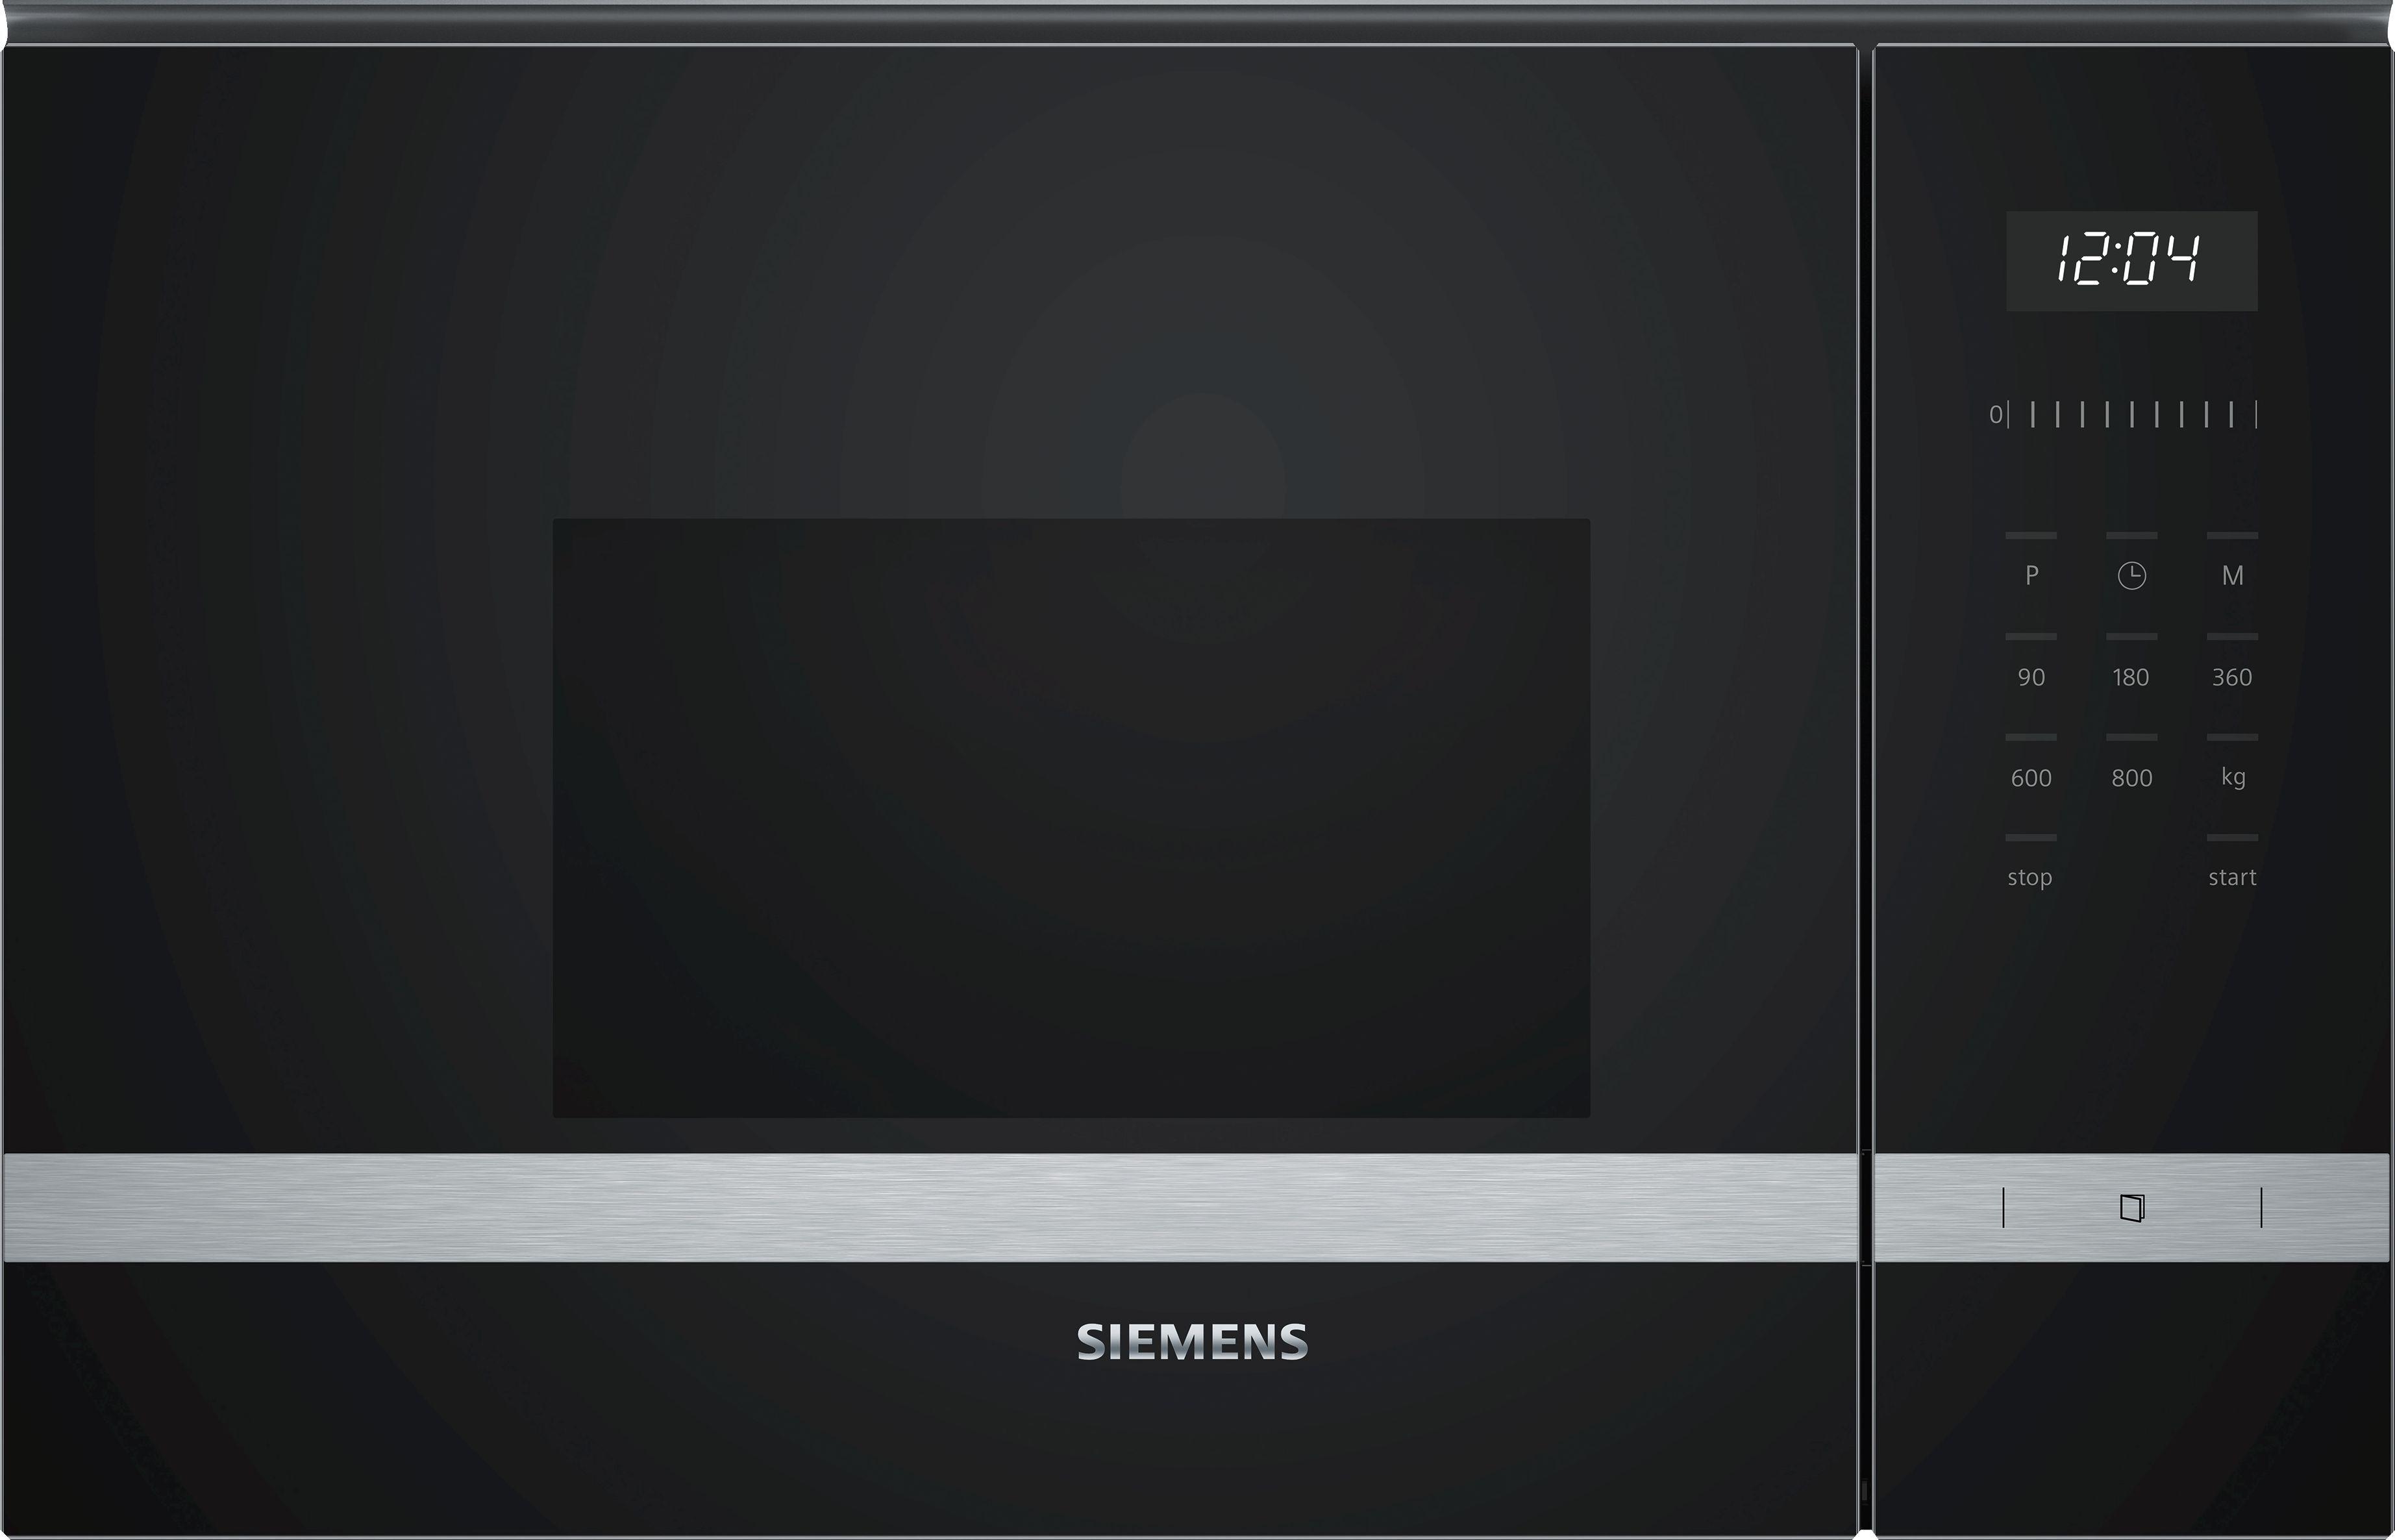 Siemens BF525LMS0 Einbau-Mikrowelle Edelstahl